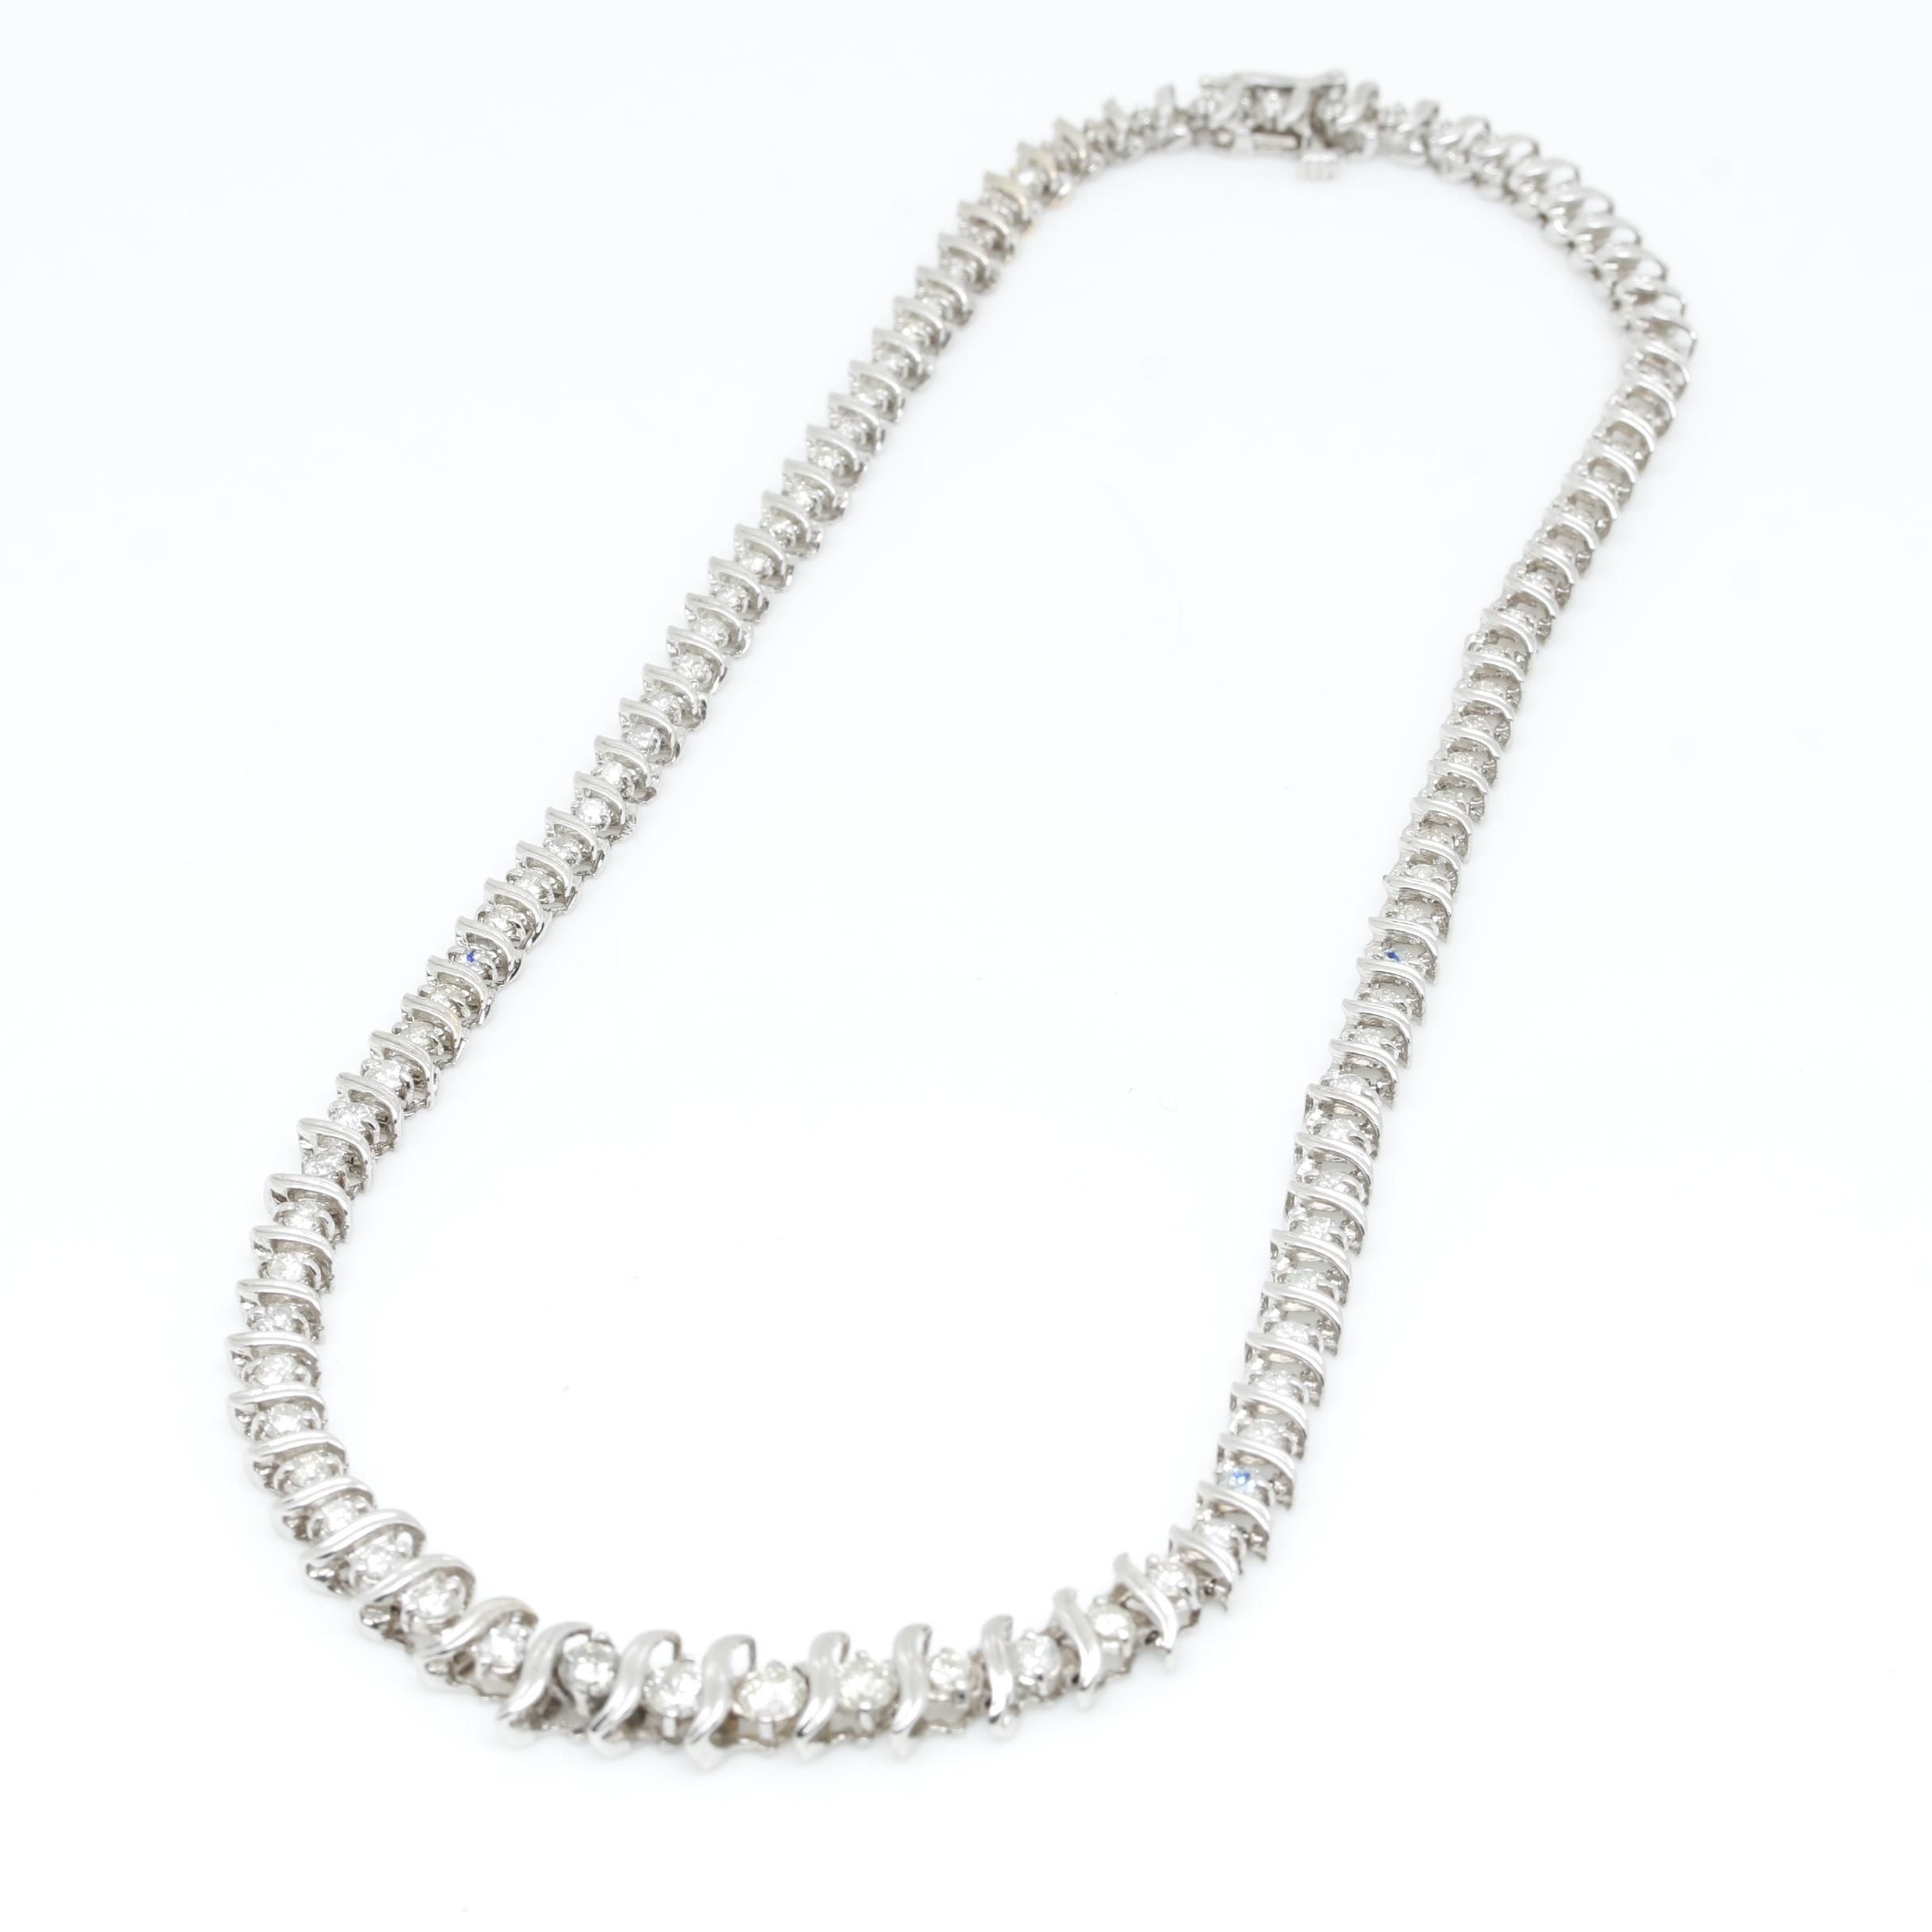 14K White Gold 3.47 CTW Diamond S-Link Graduating Necklace